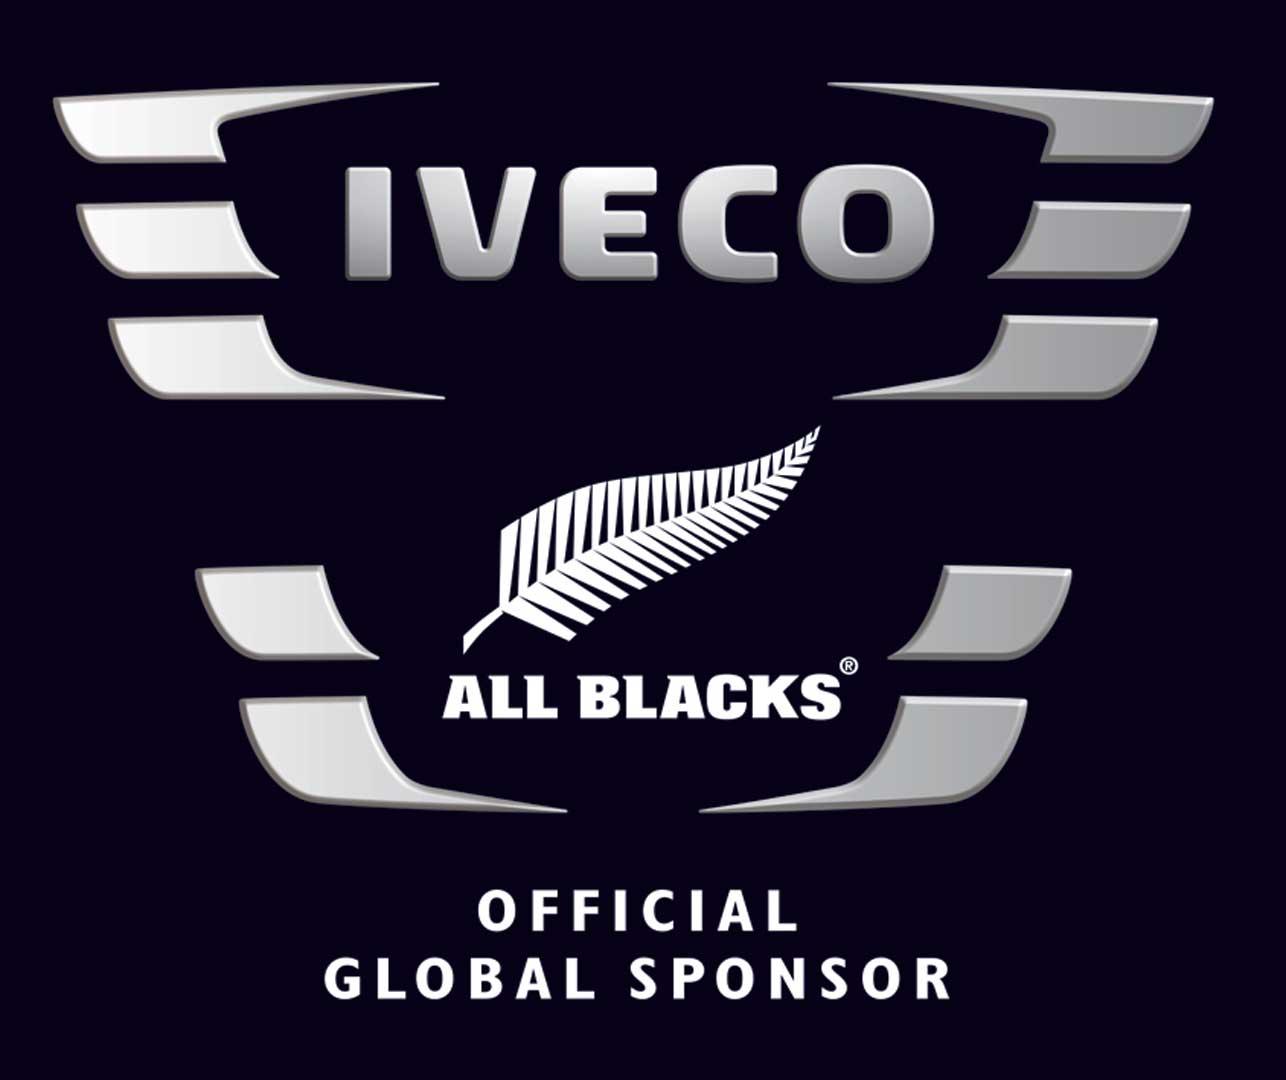 LANCIO IVECO ALL BLACKS